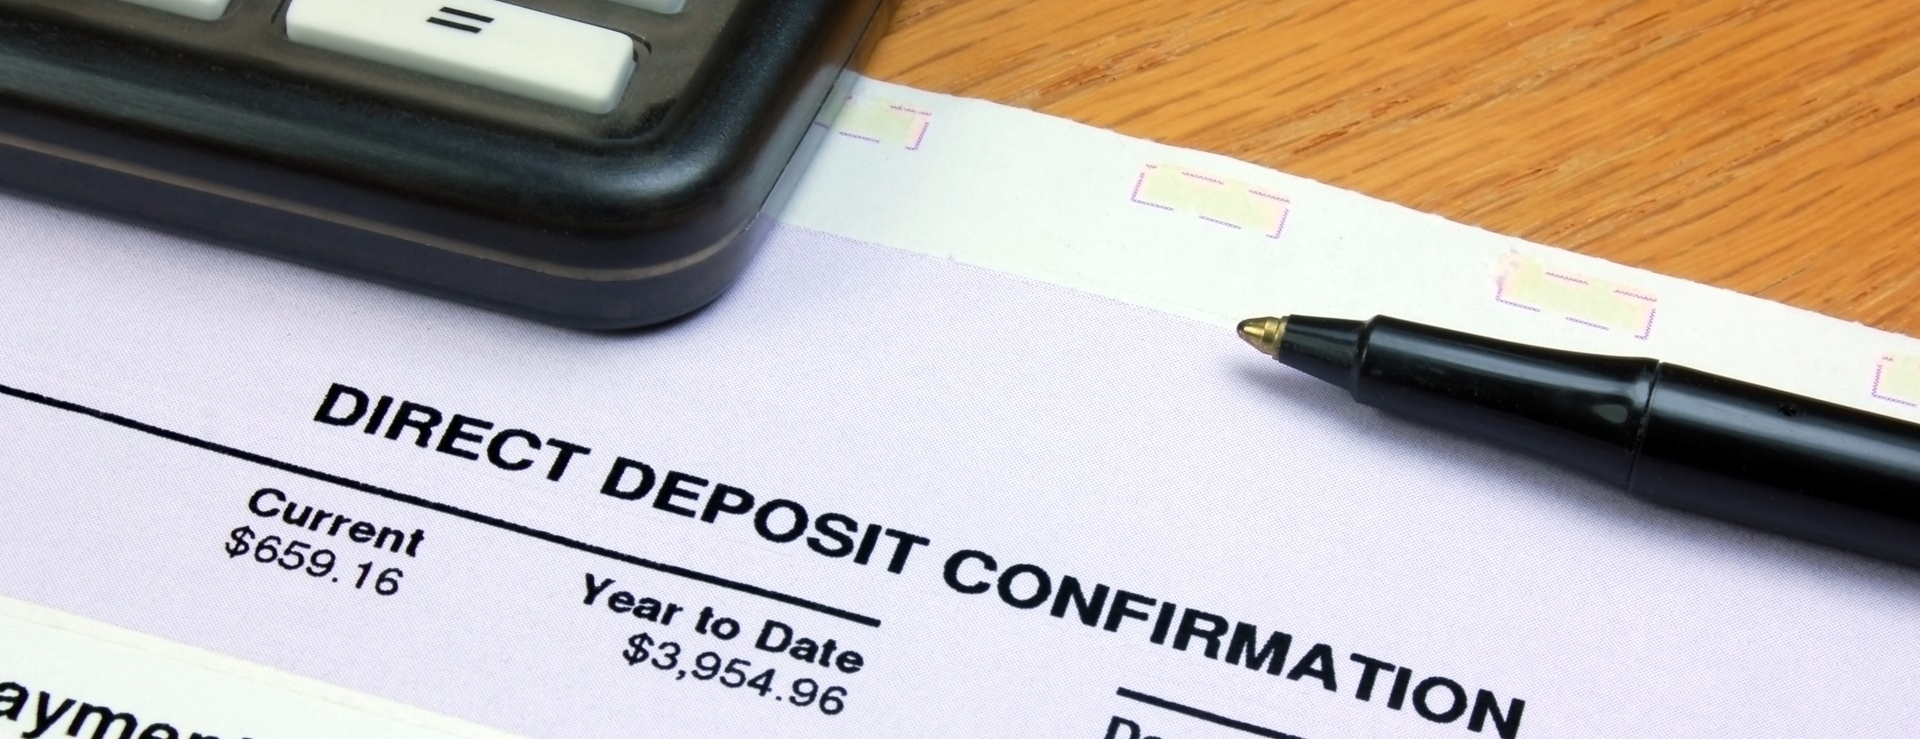 directdeposit-2